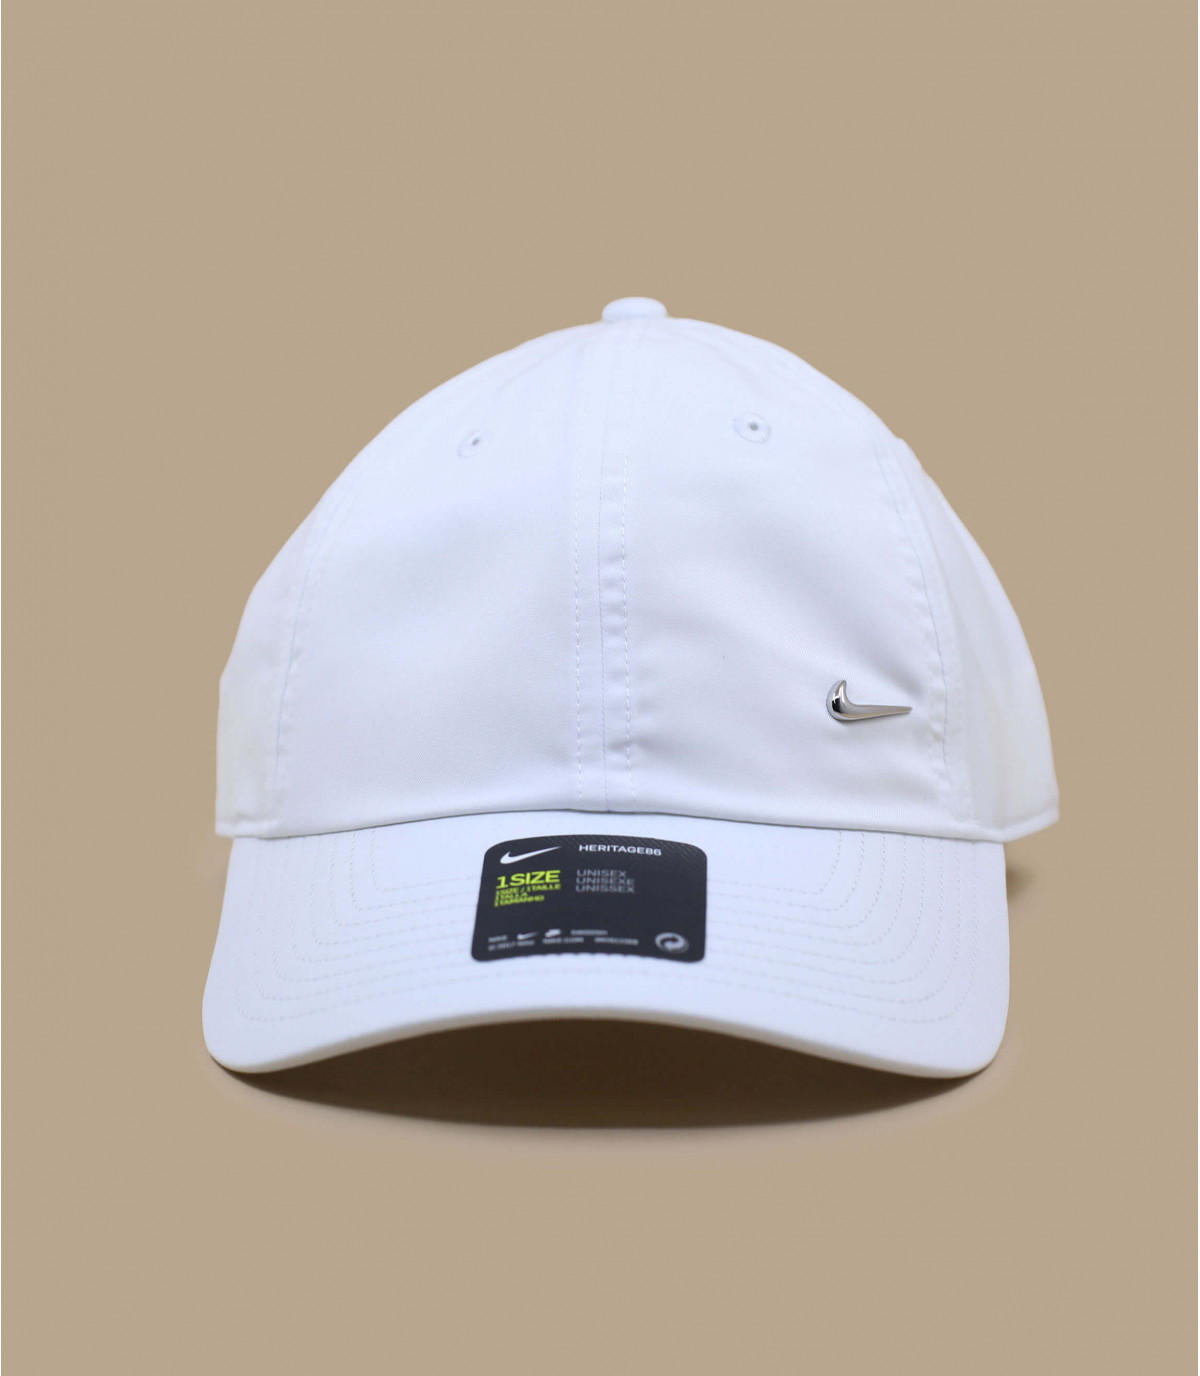 Nike cap white